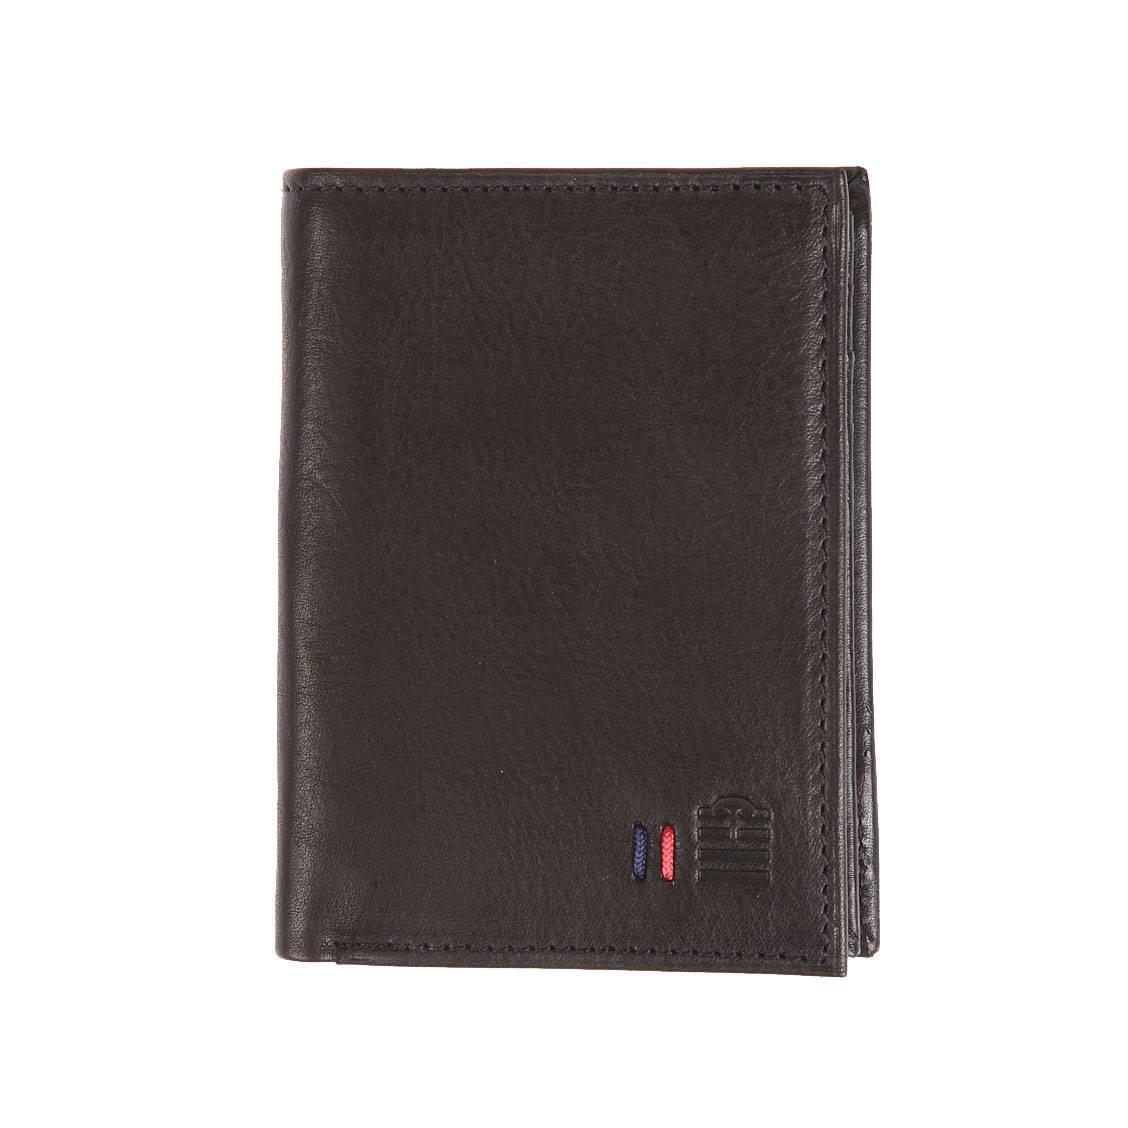 Grand portefeuille européen Serge Blanco en cuir noir à 4 volets dont 1 amovible OKW6Ykbsj